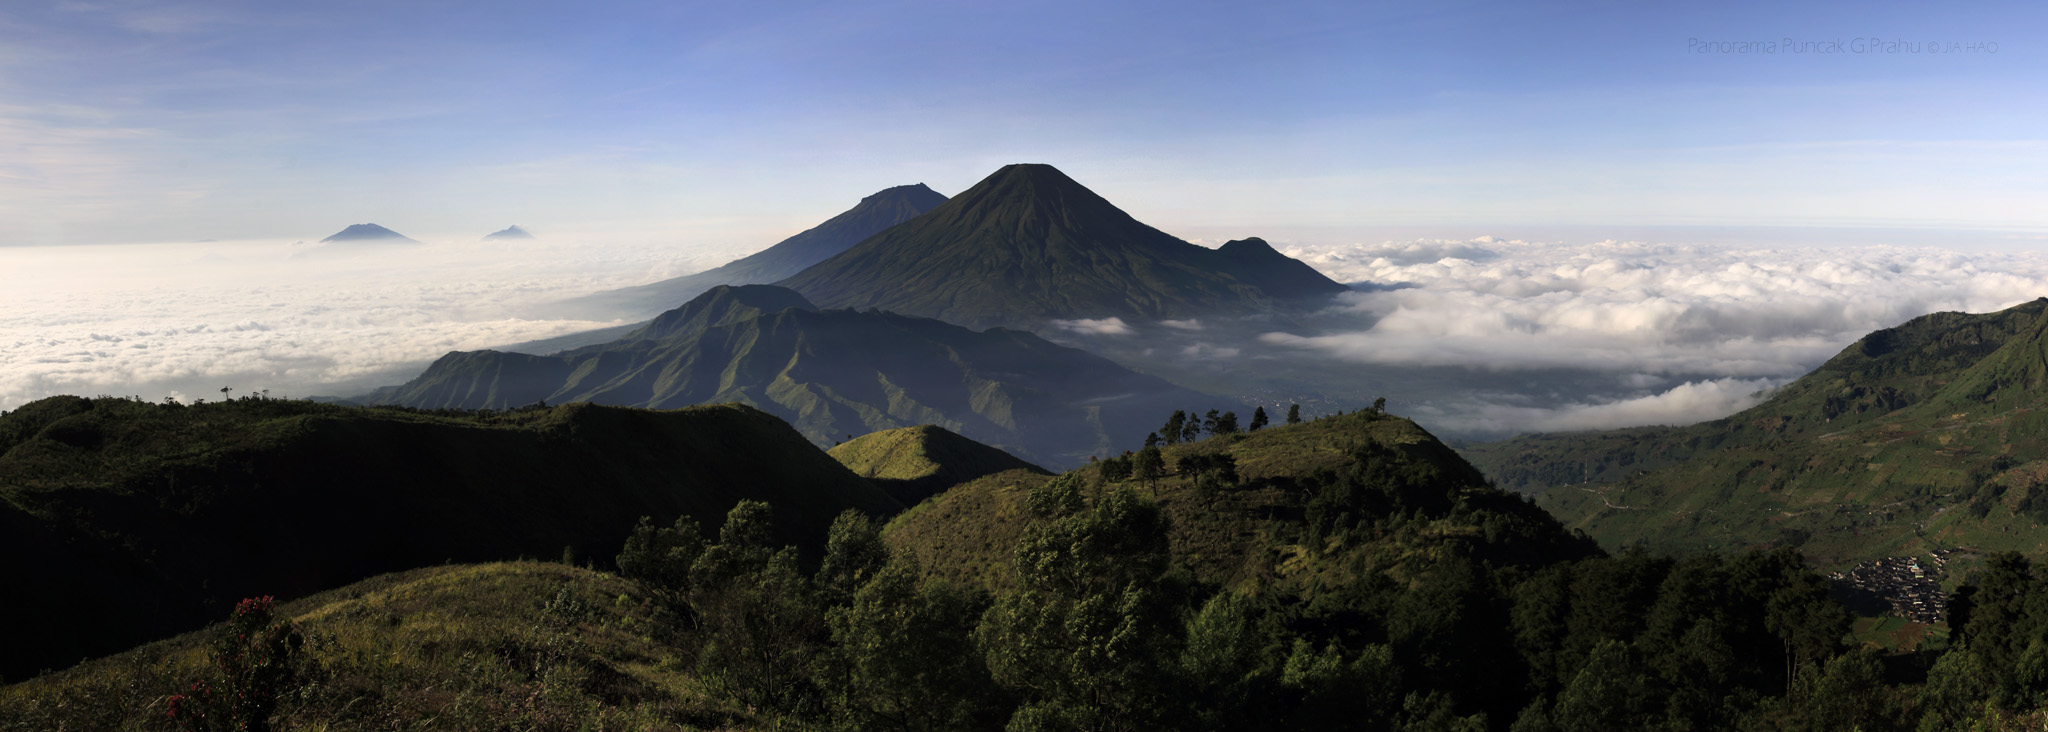 dieng-volcanic-complex